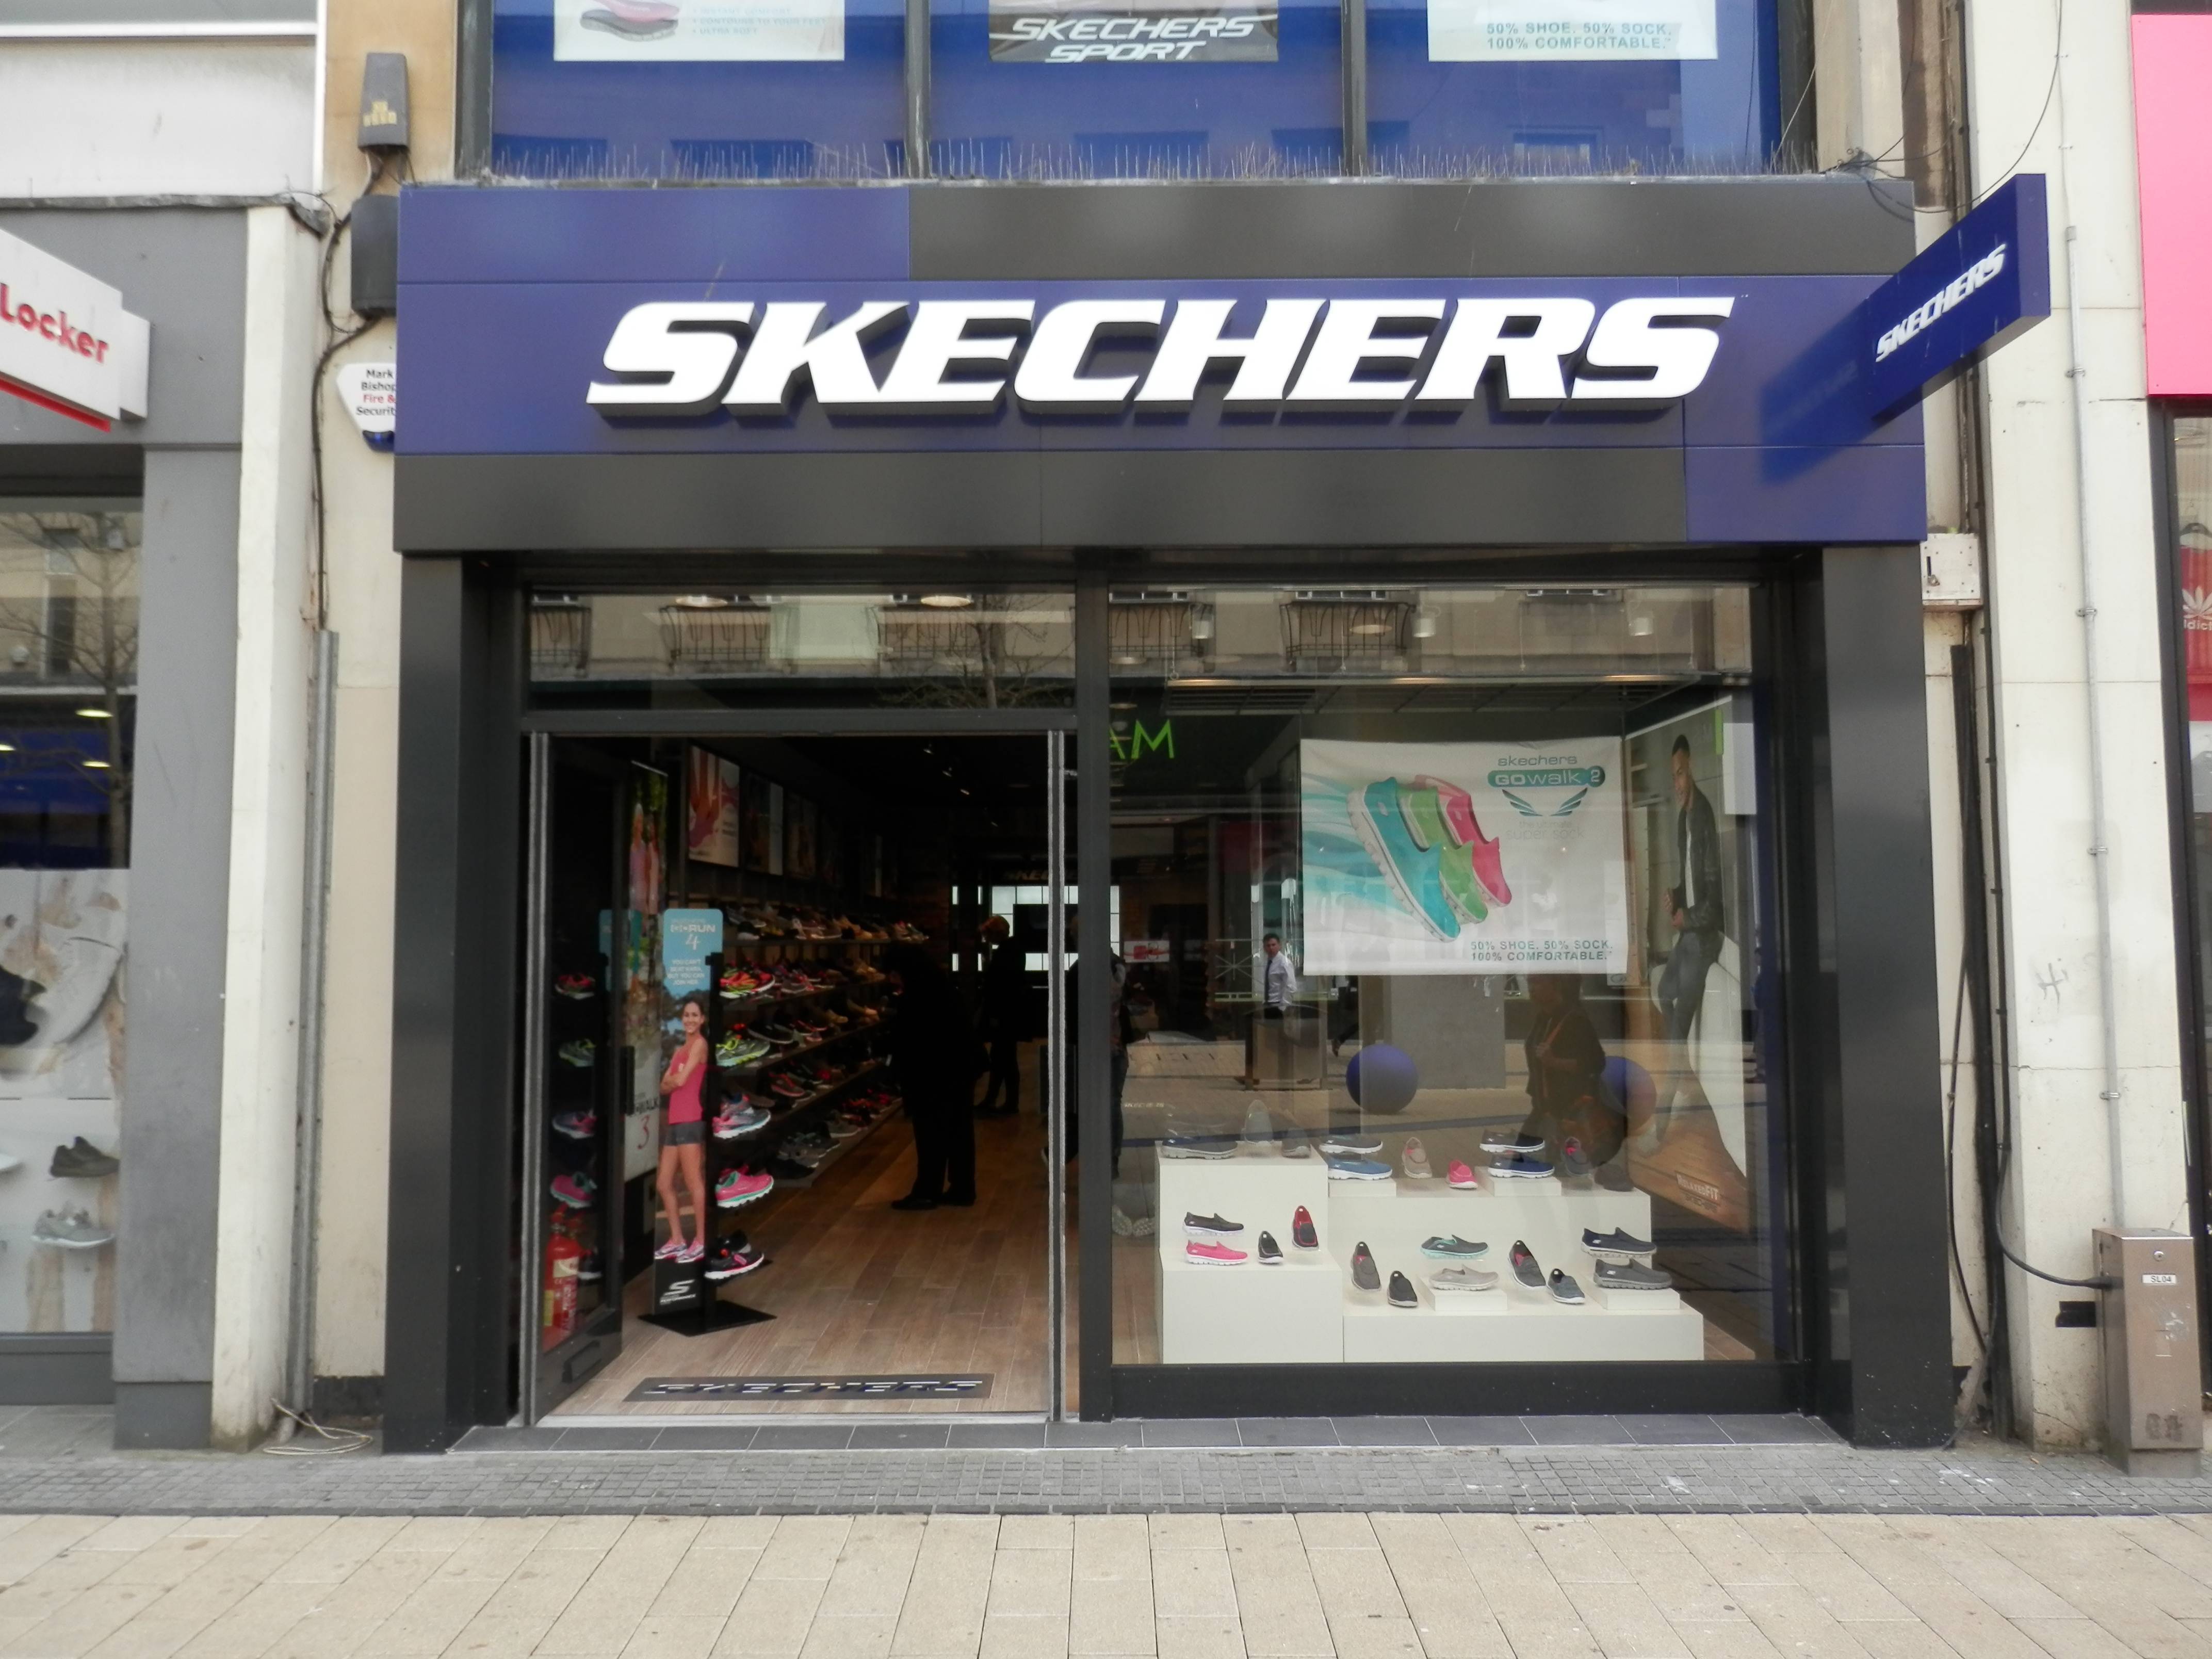 7e7932585336 Sketchers - Bristol Shopping Quarter